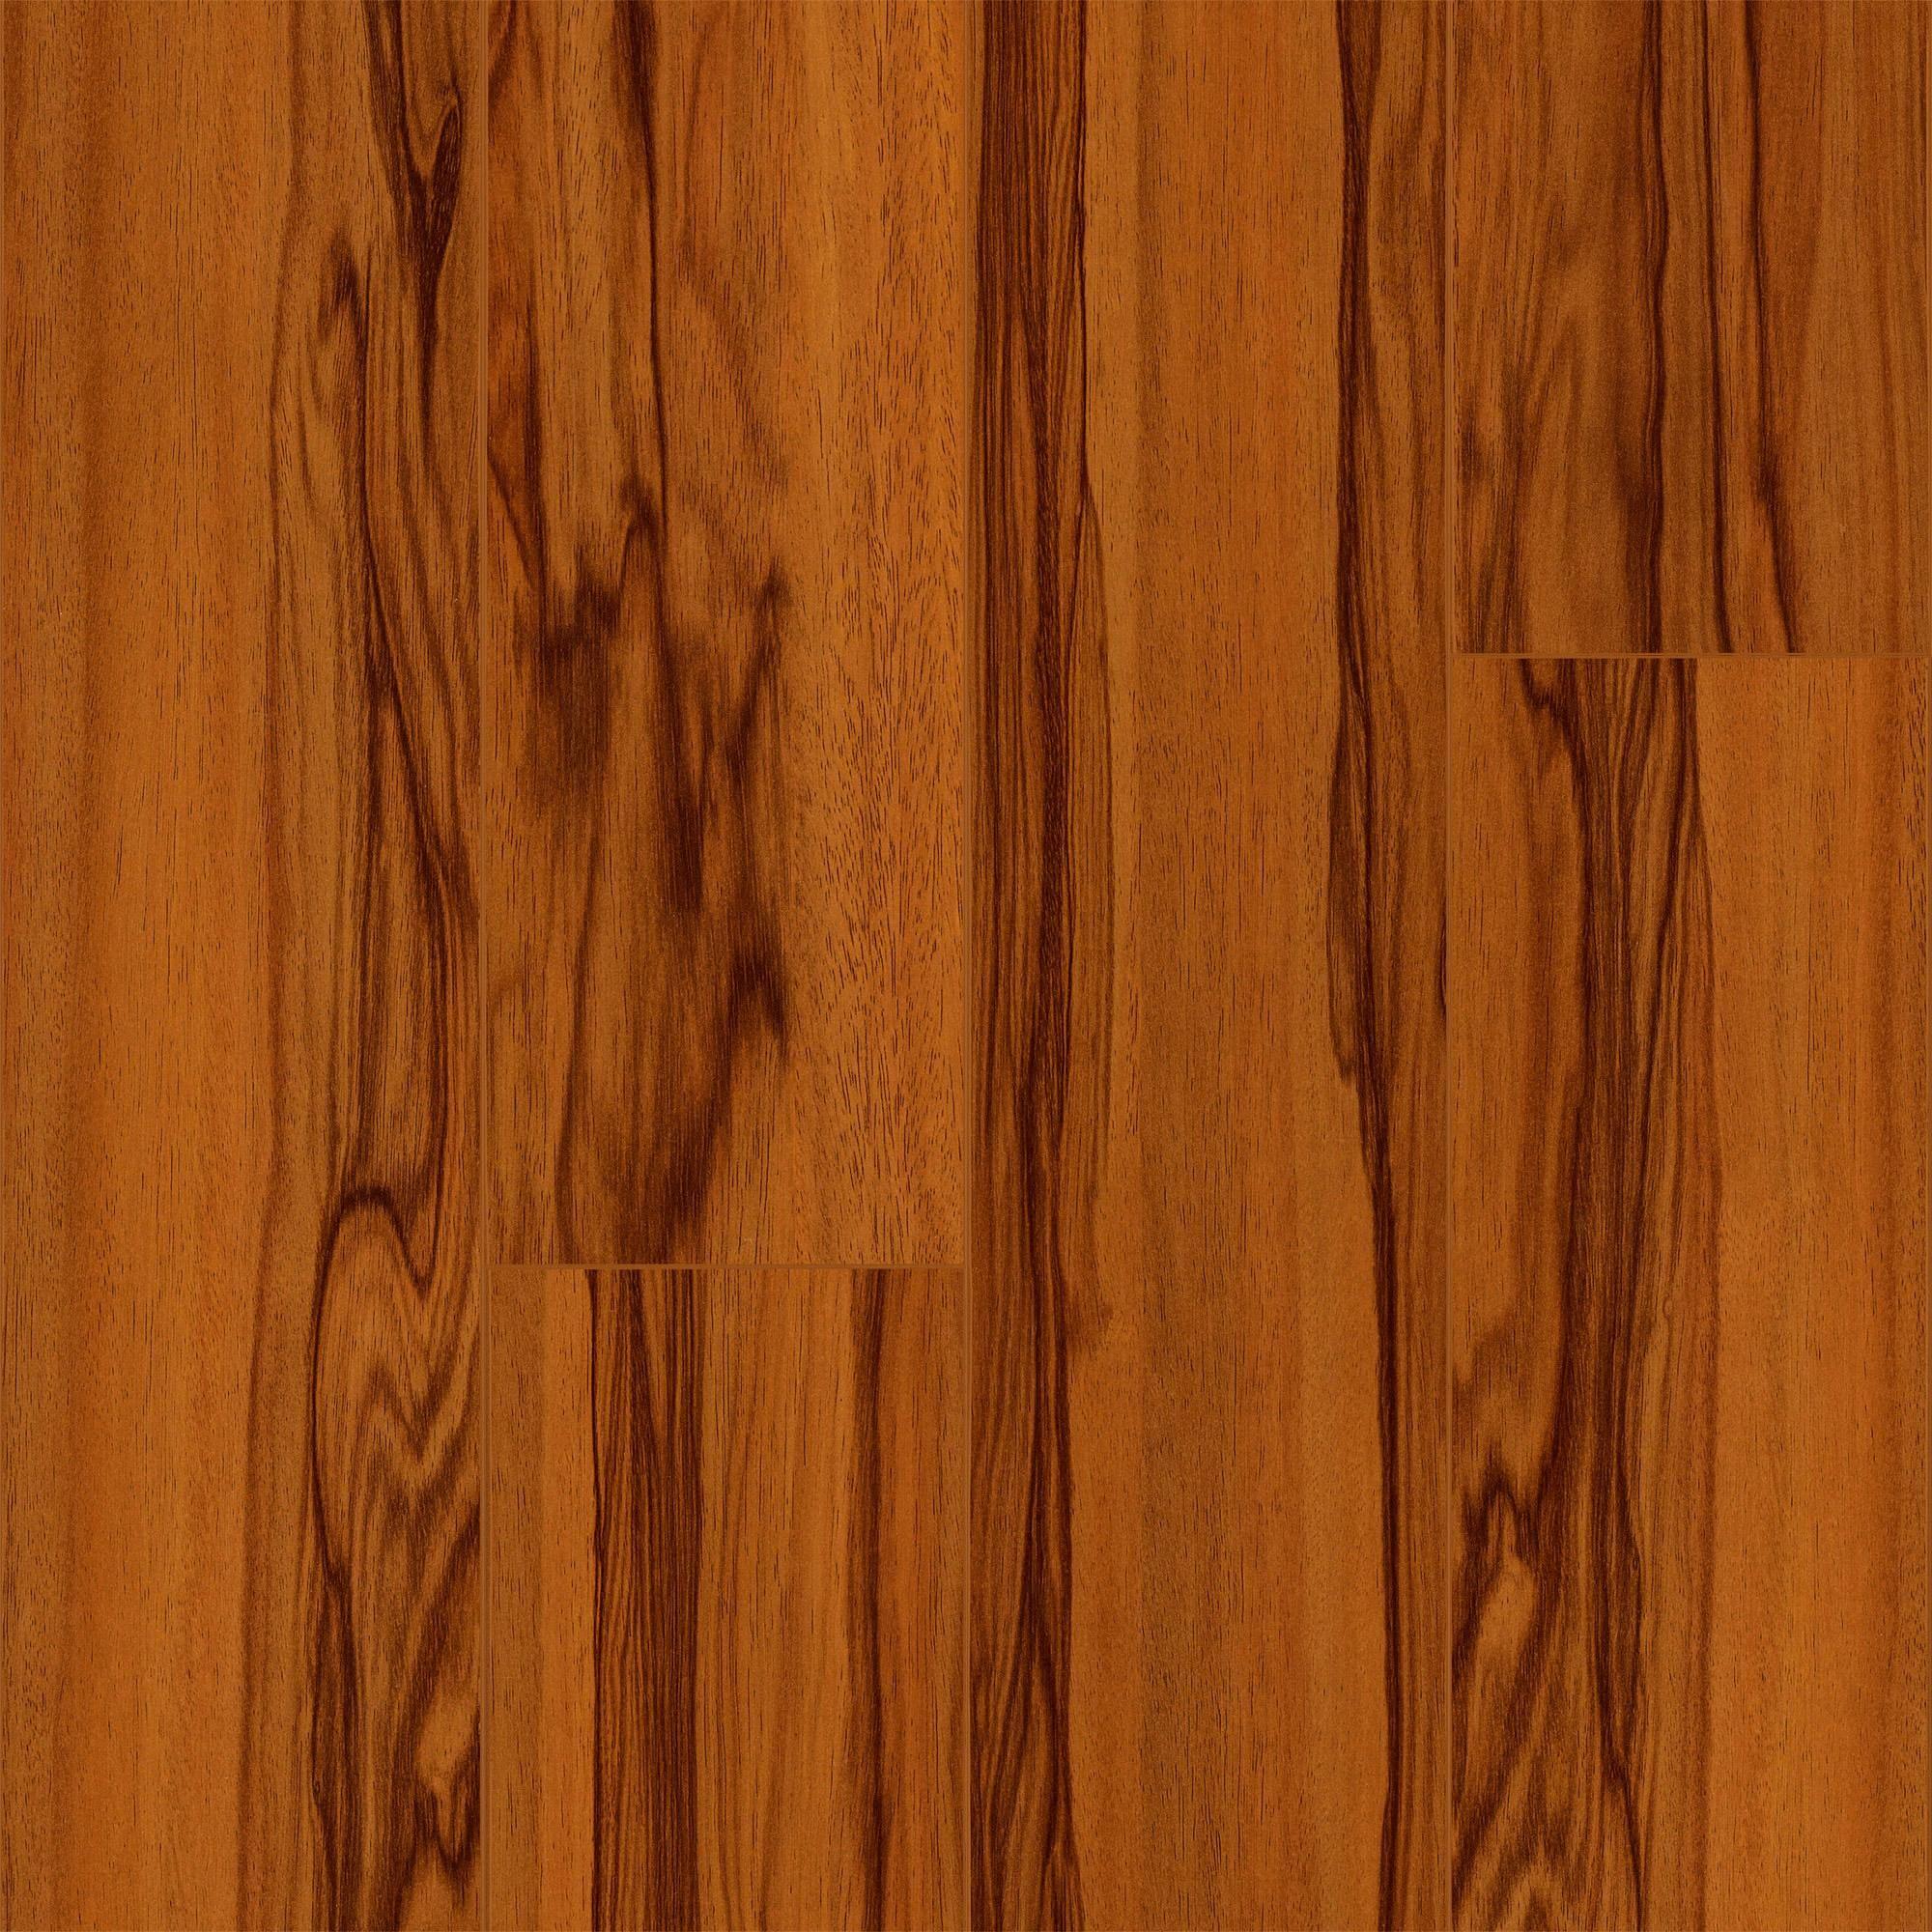 flooring tigerwood floors wood disposition tiger accesskeyid alloworigin